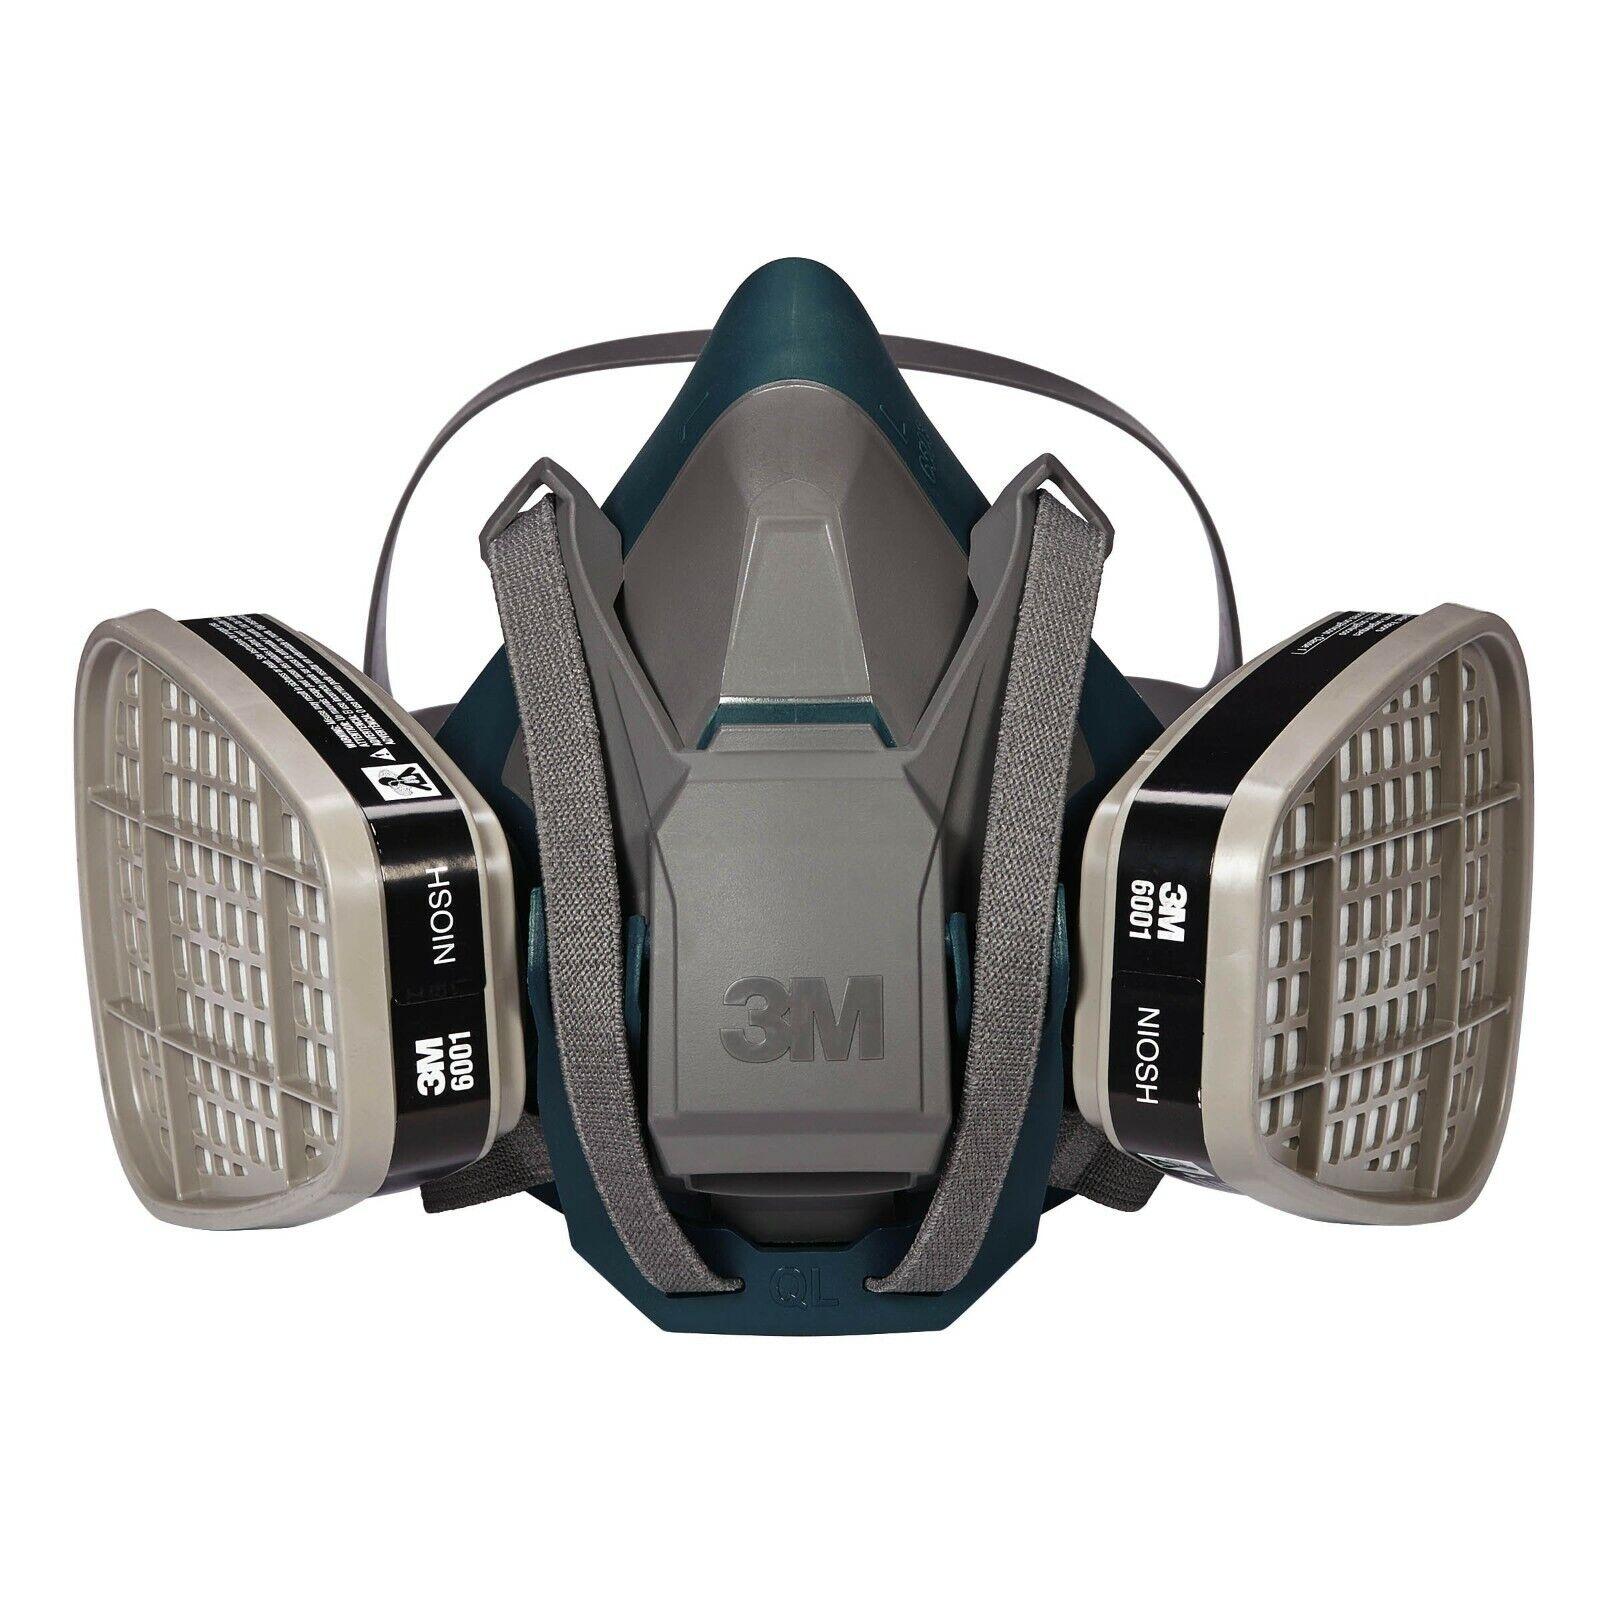 3M 6501QL Rugged Respirator  & 2 EA 6001 Organic Vapor Cartridge, SMALL Business & Industrial